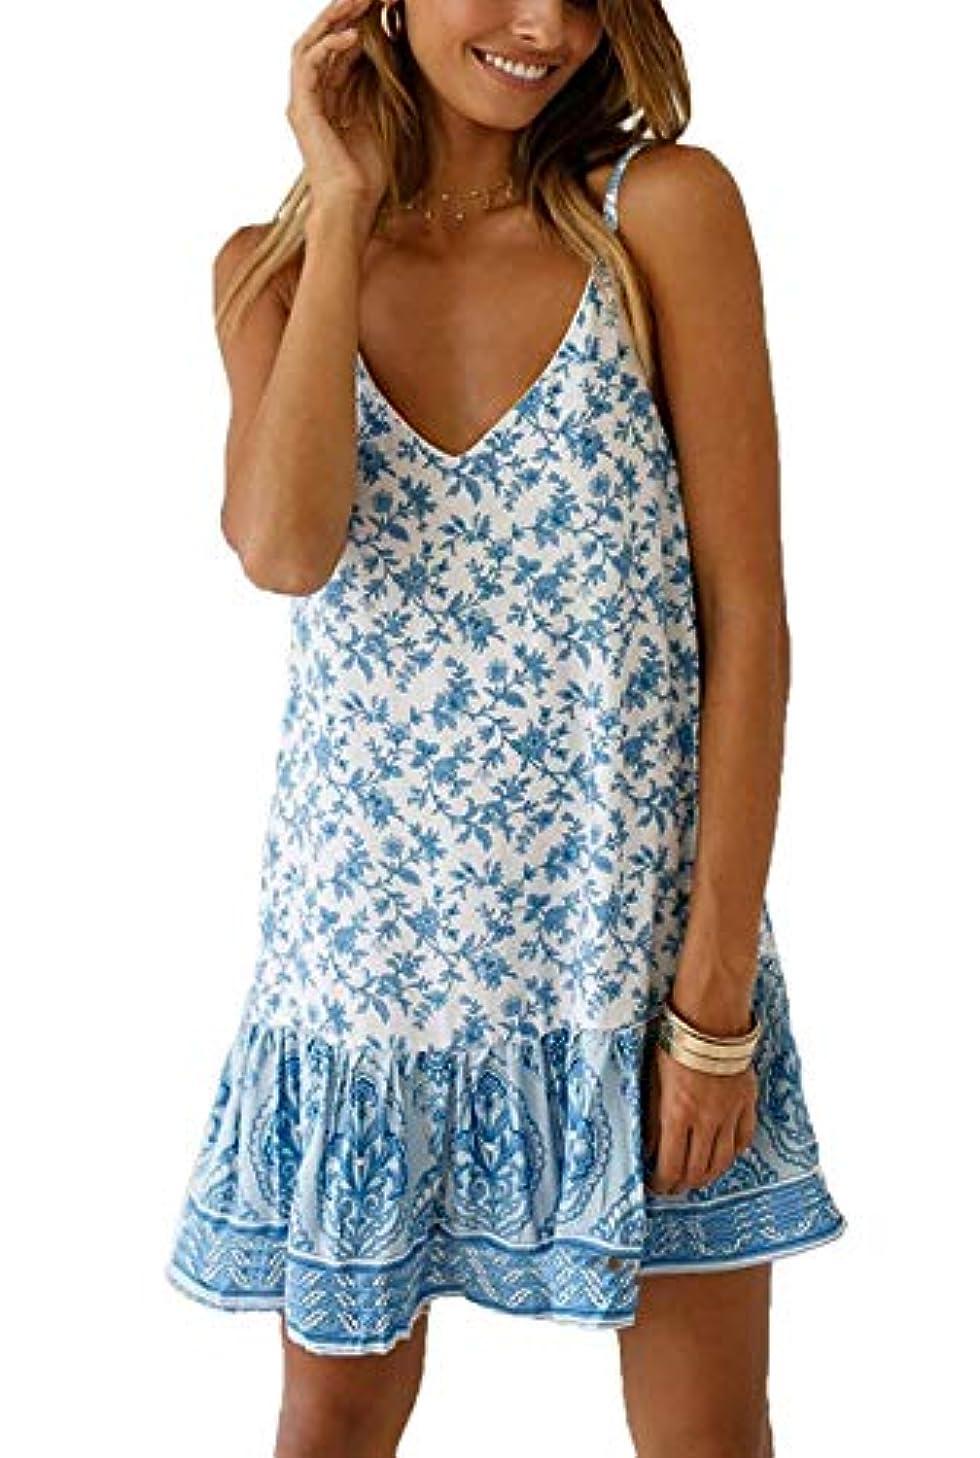 Womens Summer V Neck Spaghetti Strap Sundress Casual Floral Printed Sleeveless Mini Dress